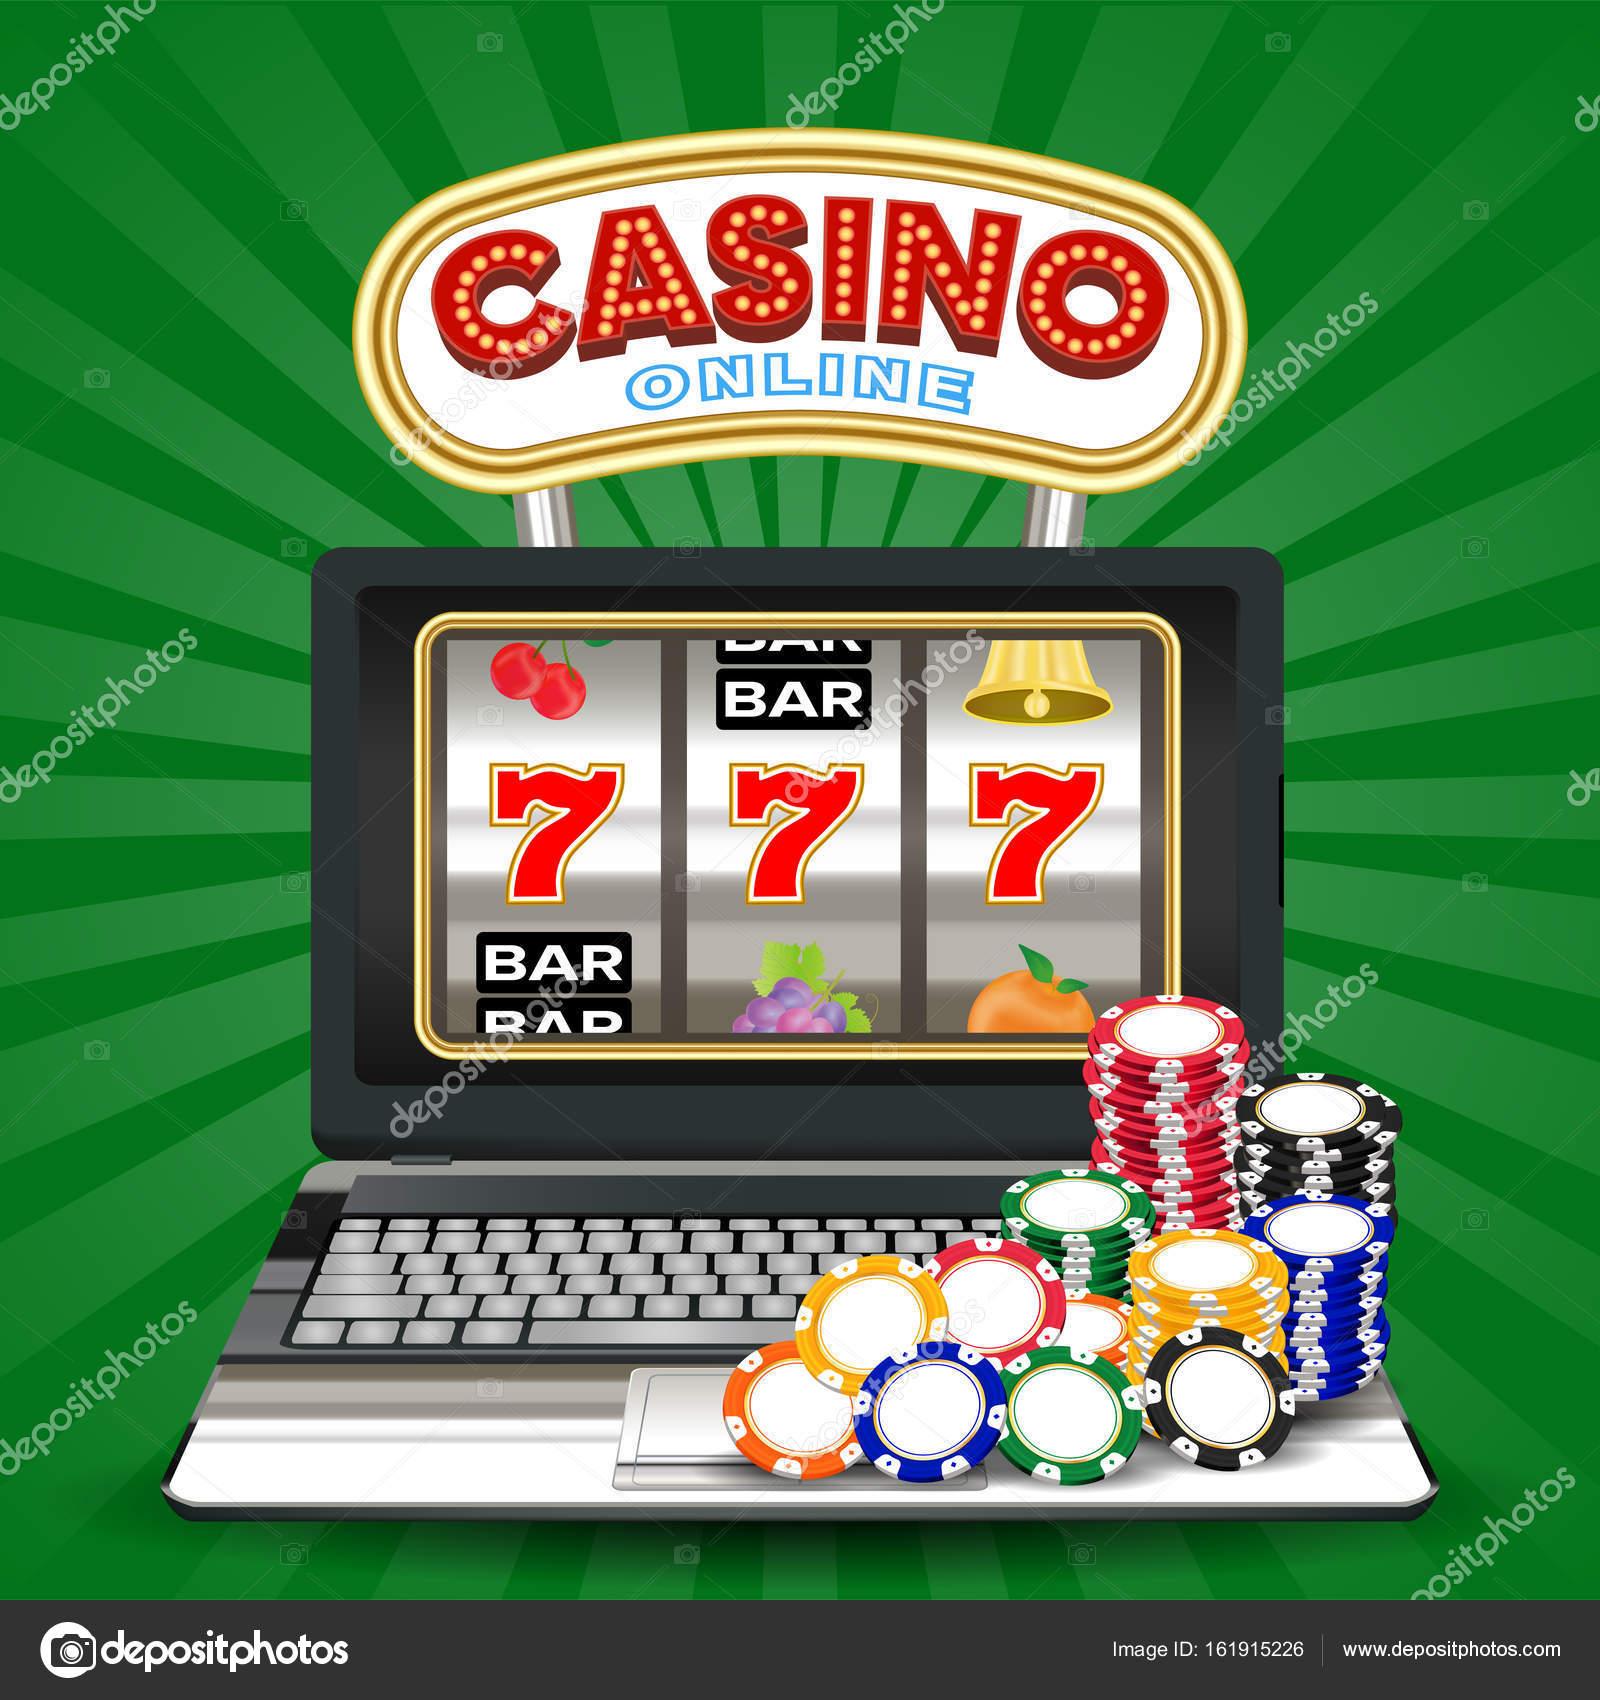 Казино онлайн вход играть покер онлайн на фантики